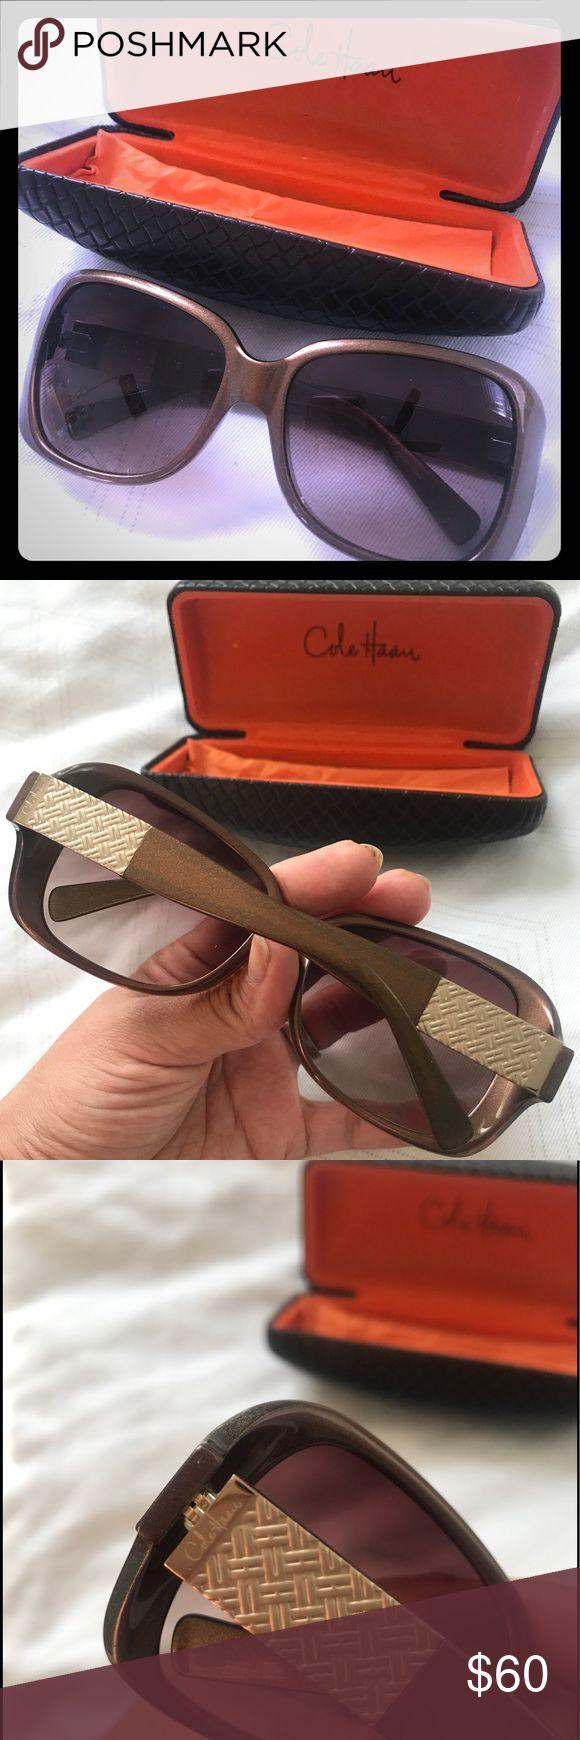 Marvelous Cole Haan oversized sunglasses